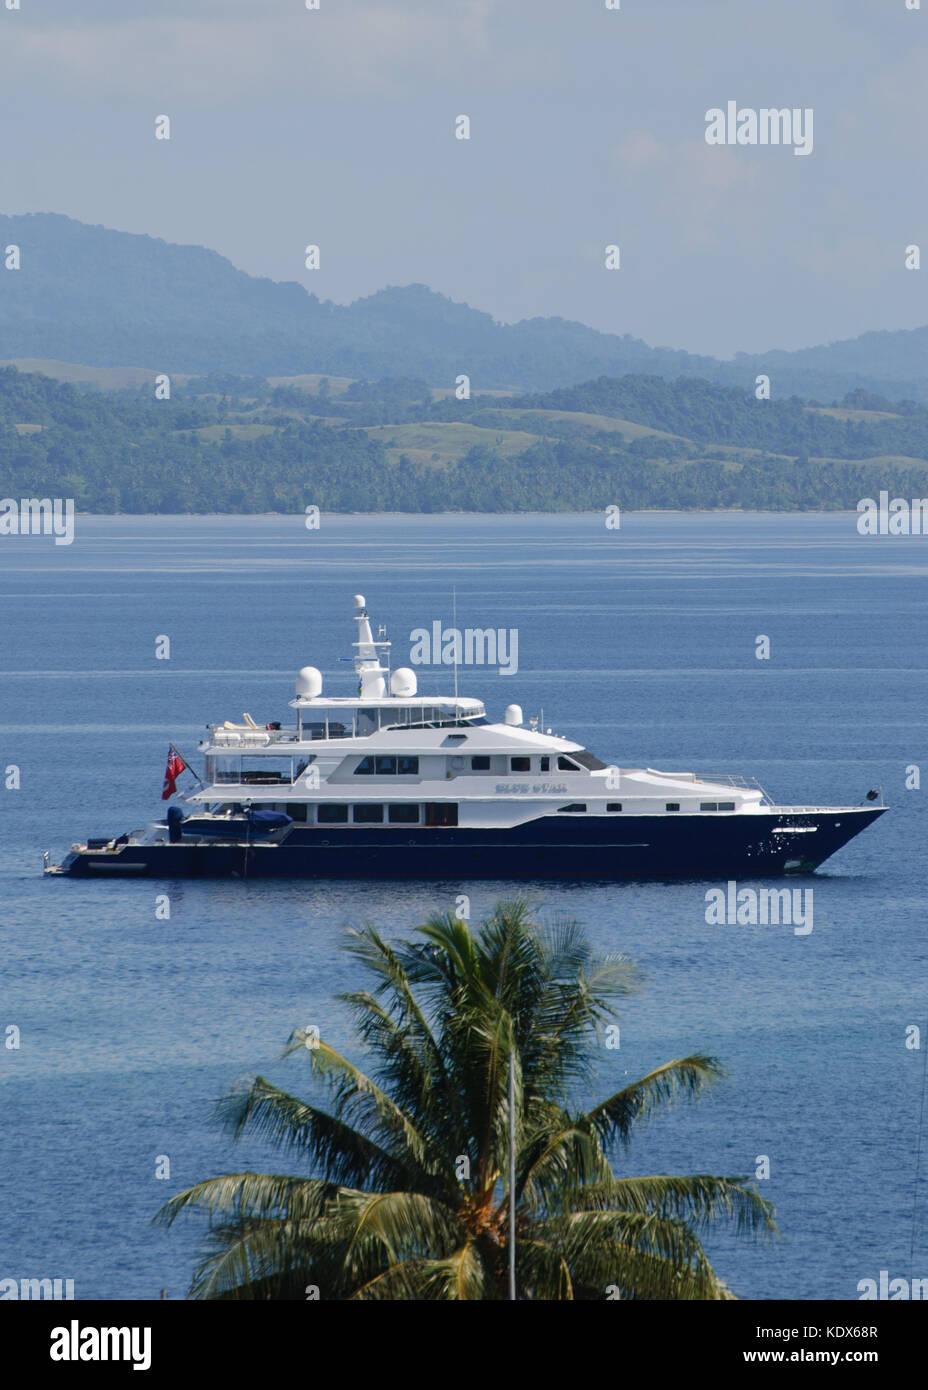 Superyacht in Solomon Island Waters - Stock Image